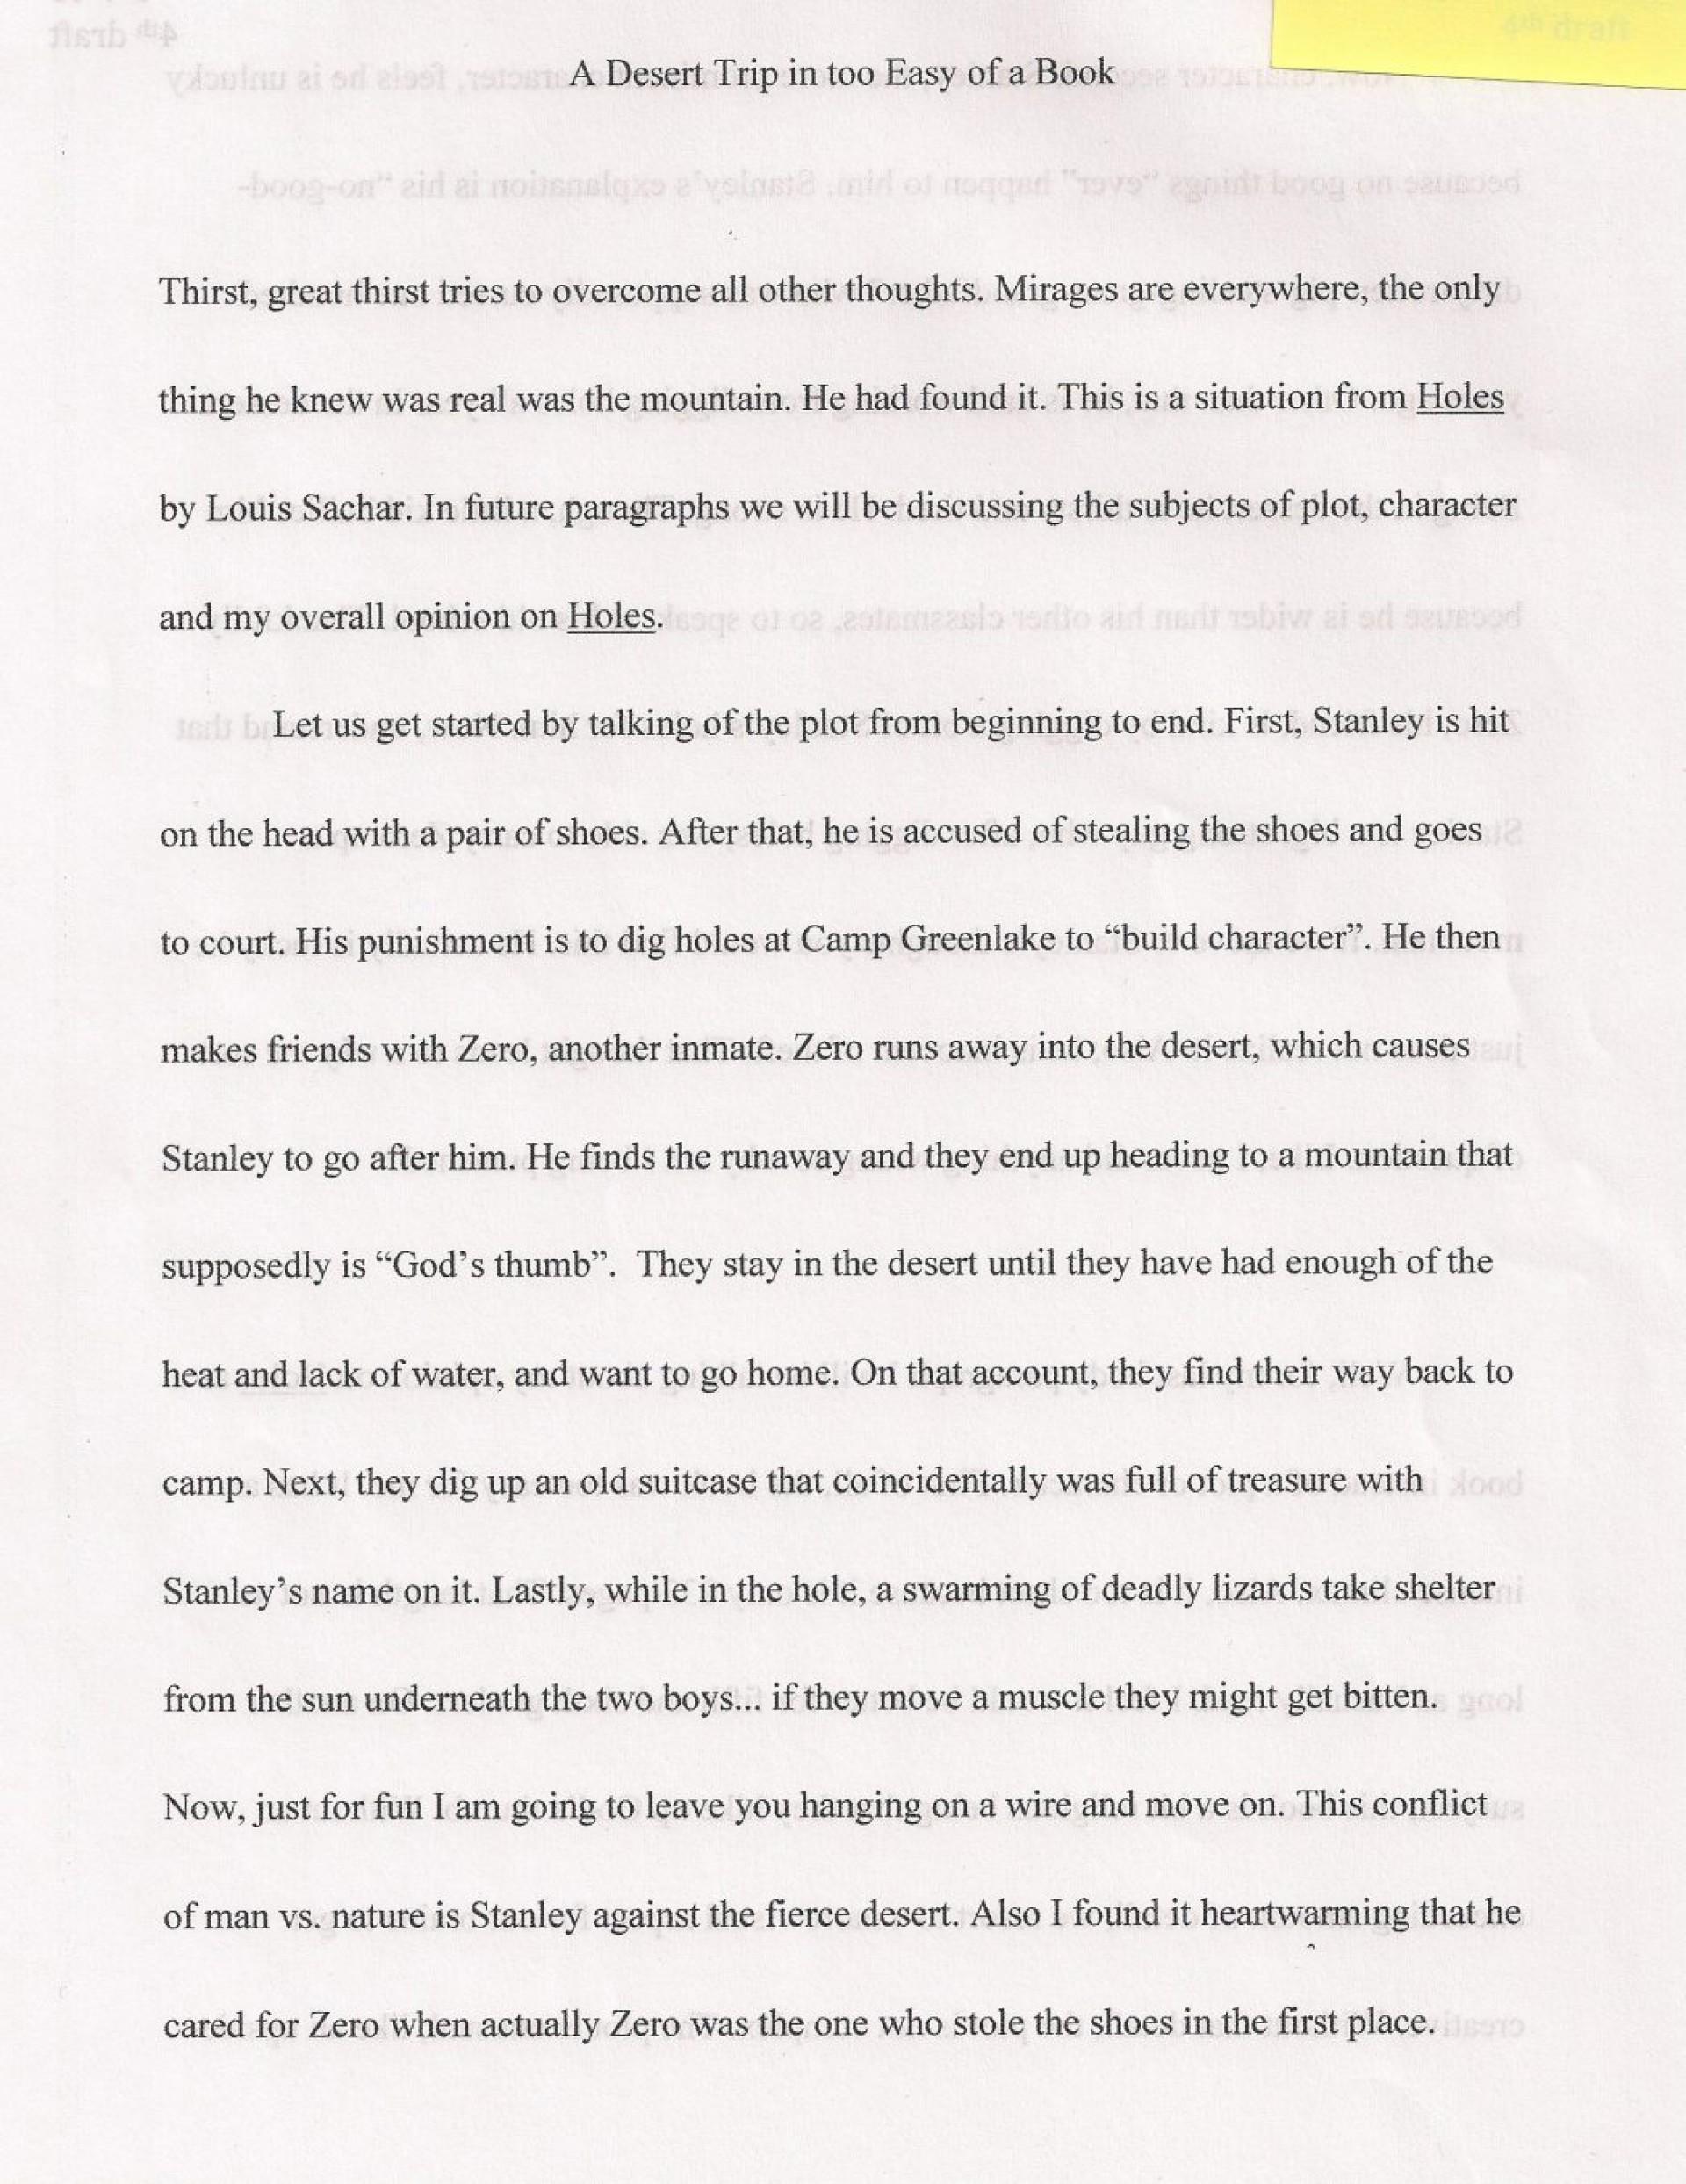 003 Sample Argumentative Essay High School Persuasive On Wearing Uniforms Conclusion Paragraph Desert 1048x1358 Example Breathtaking Holes Black 1920